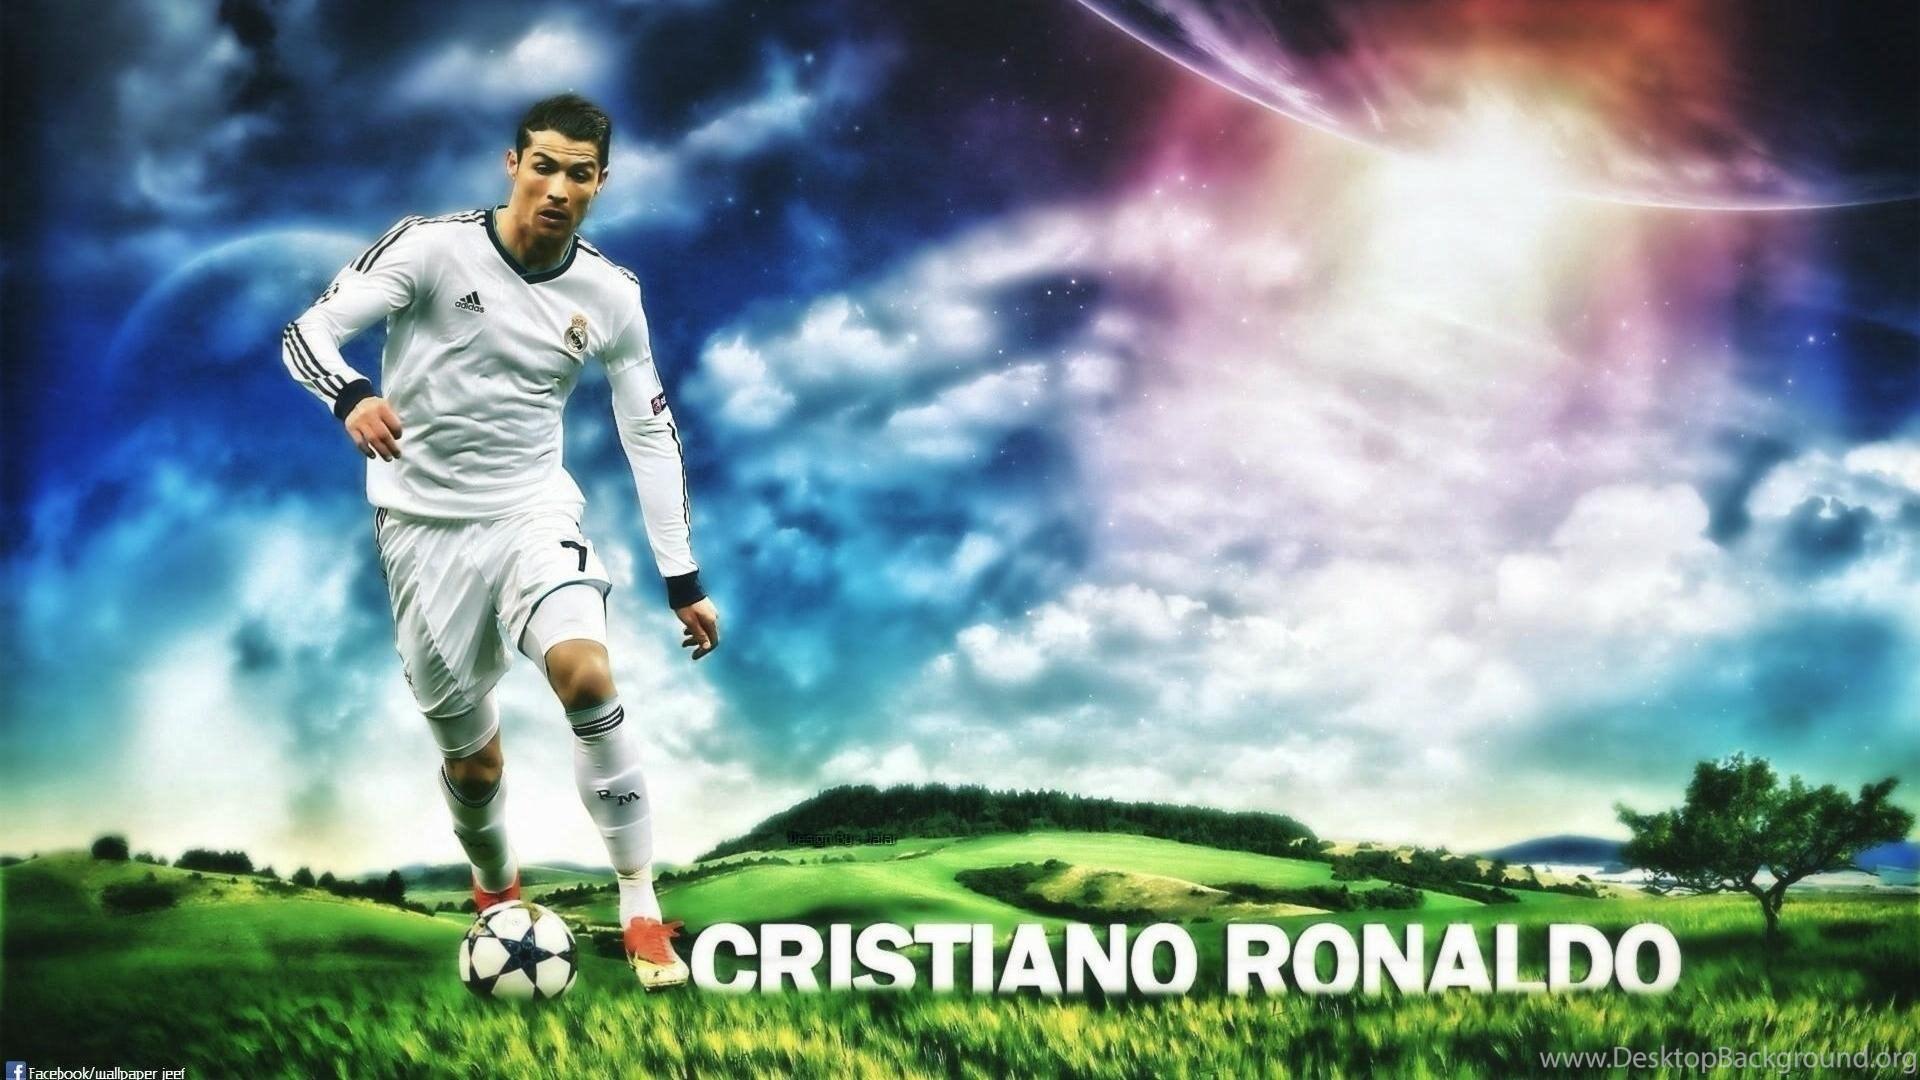 Cristiano ronaldo wallpapers desktop background popular voltagebd Images